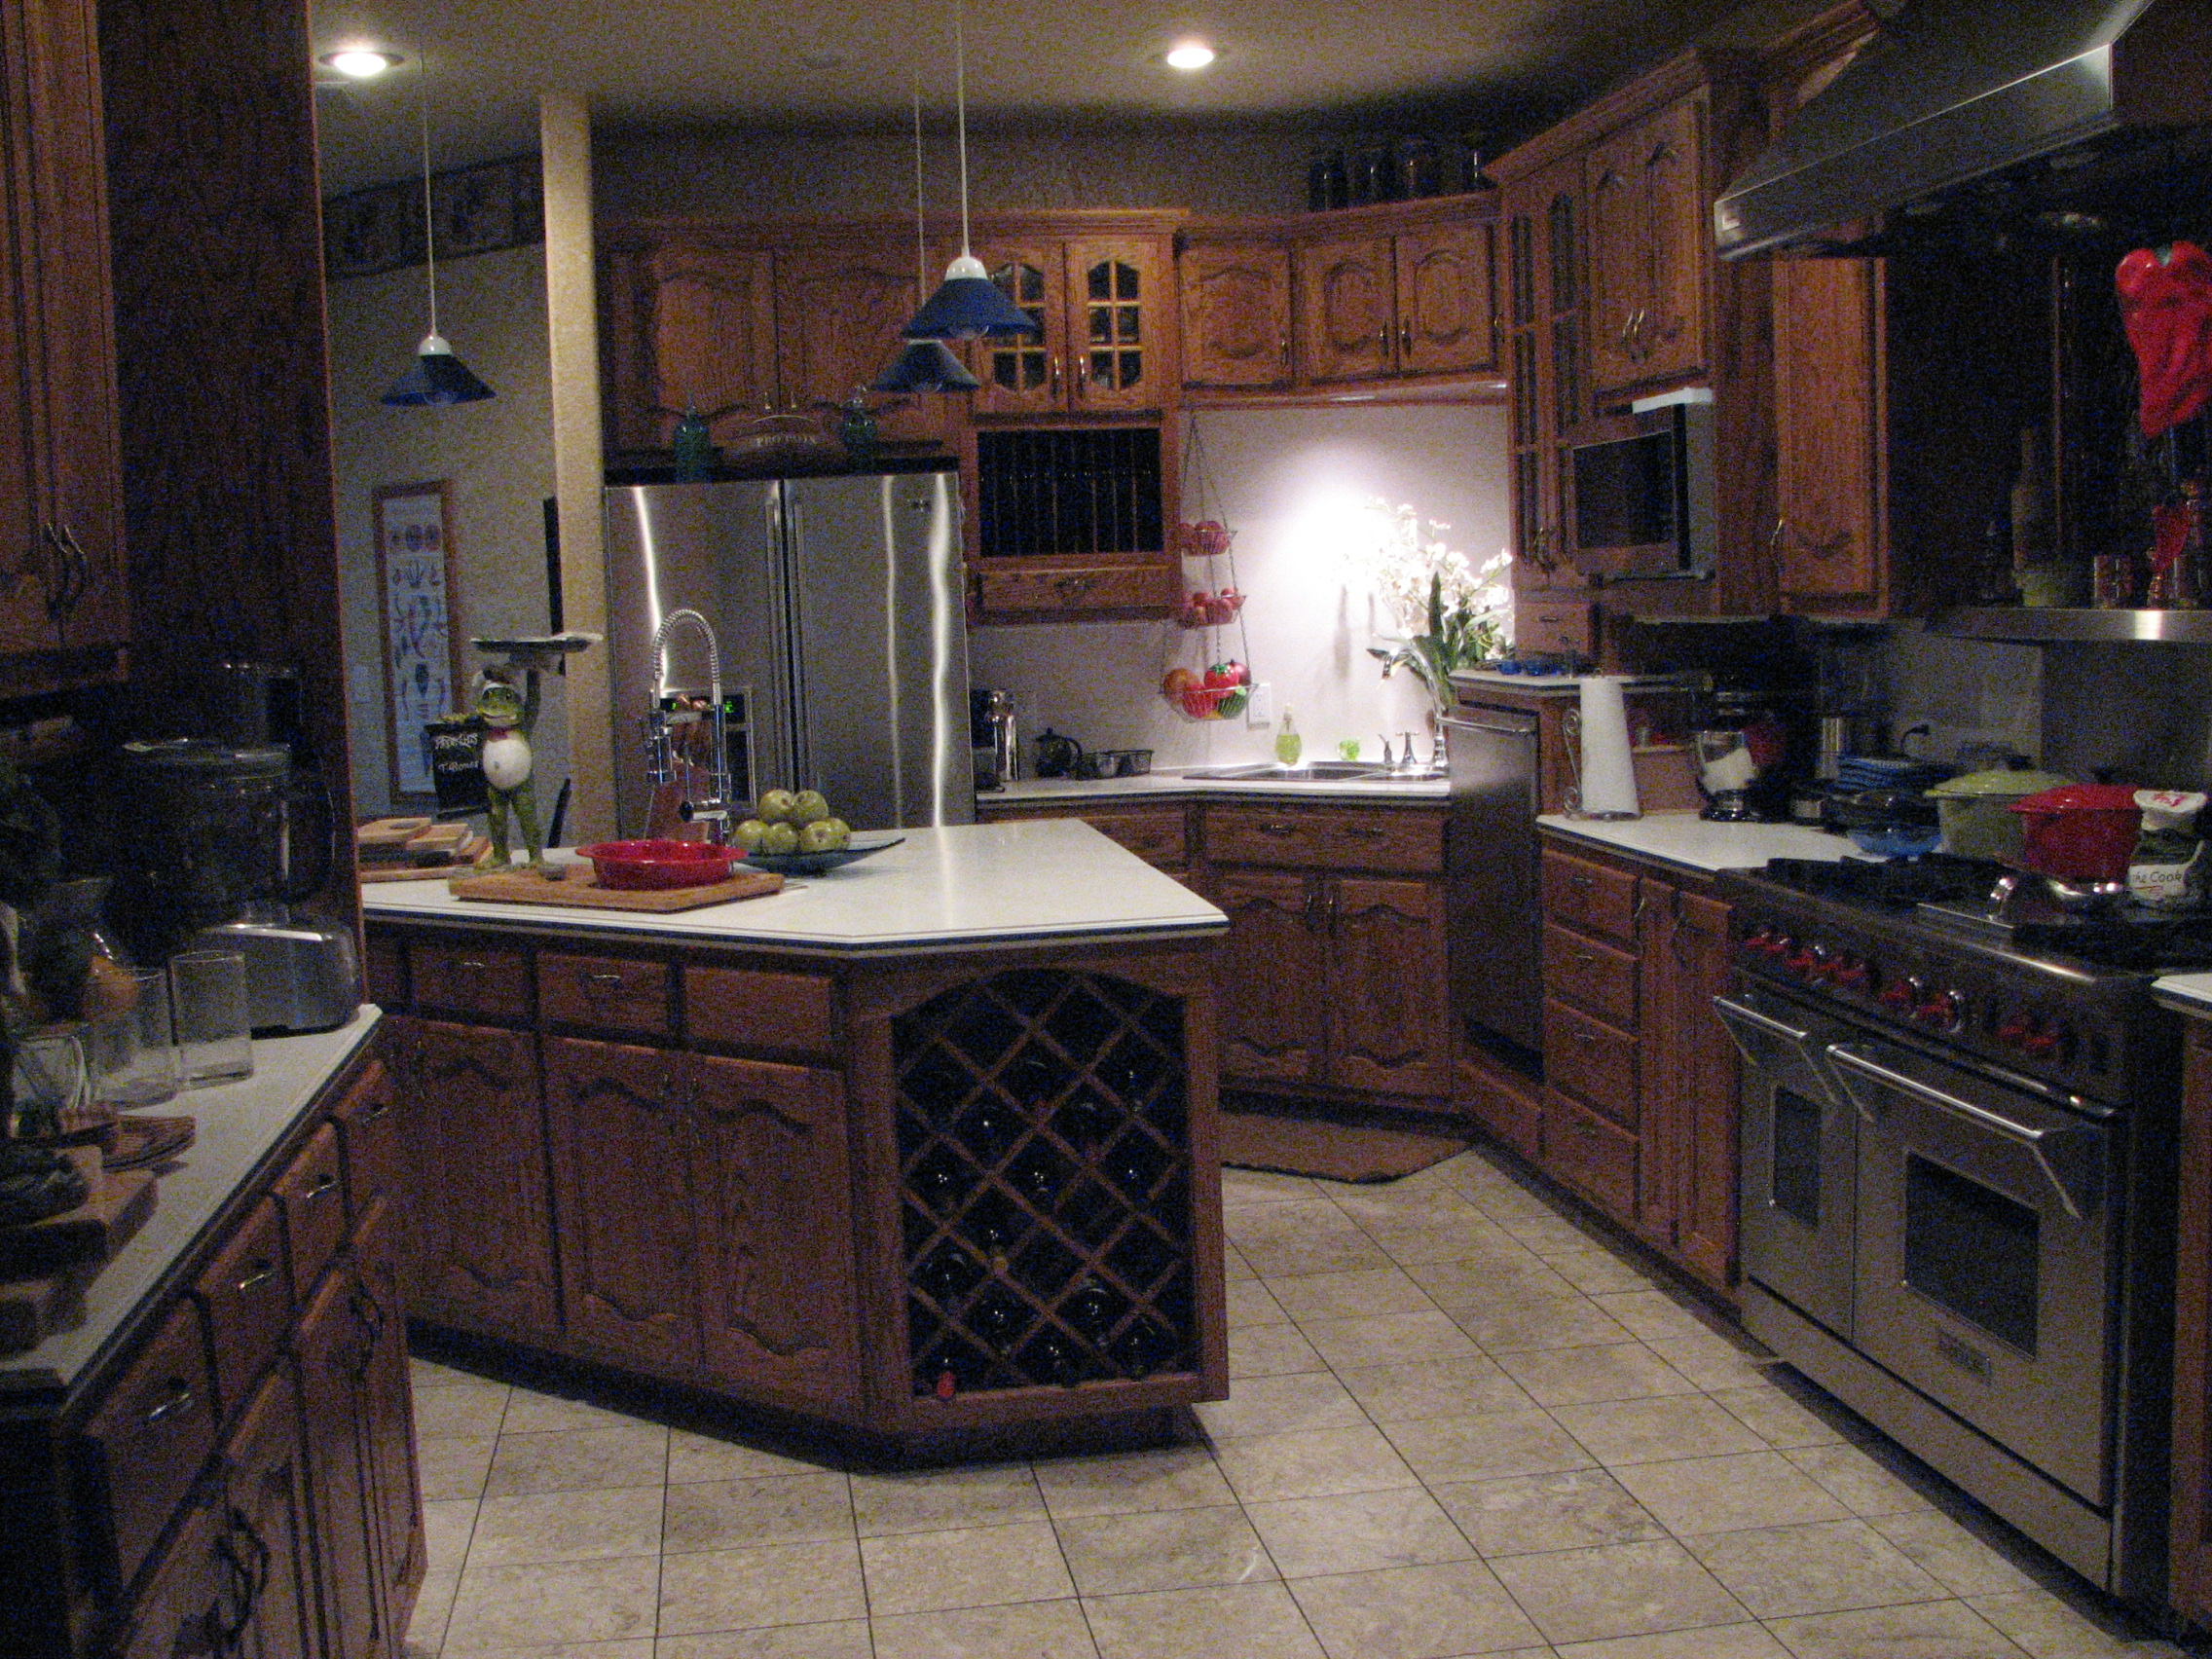 Artistic kitchen upgrades austin texas for Kitchen remodeling austin tx